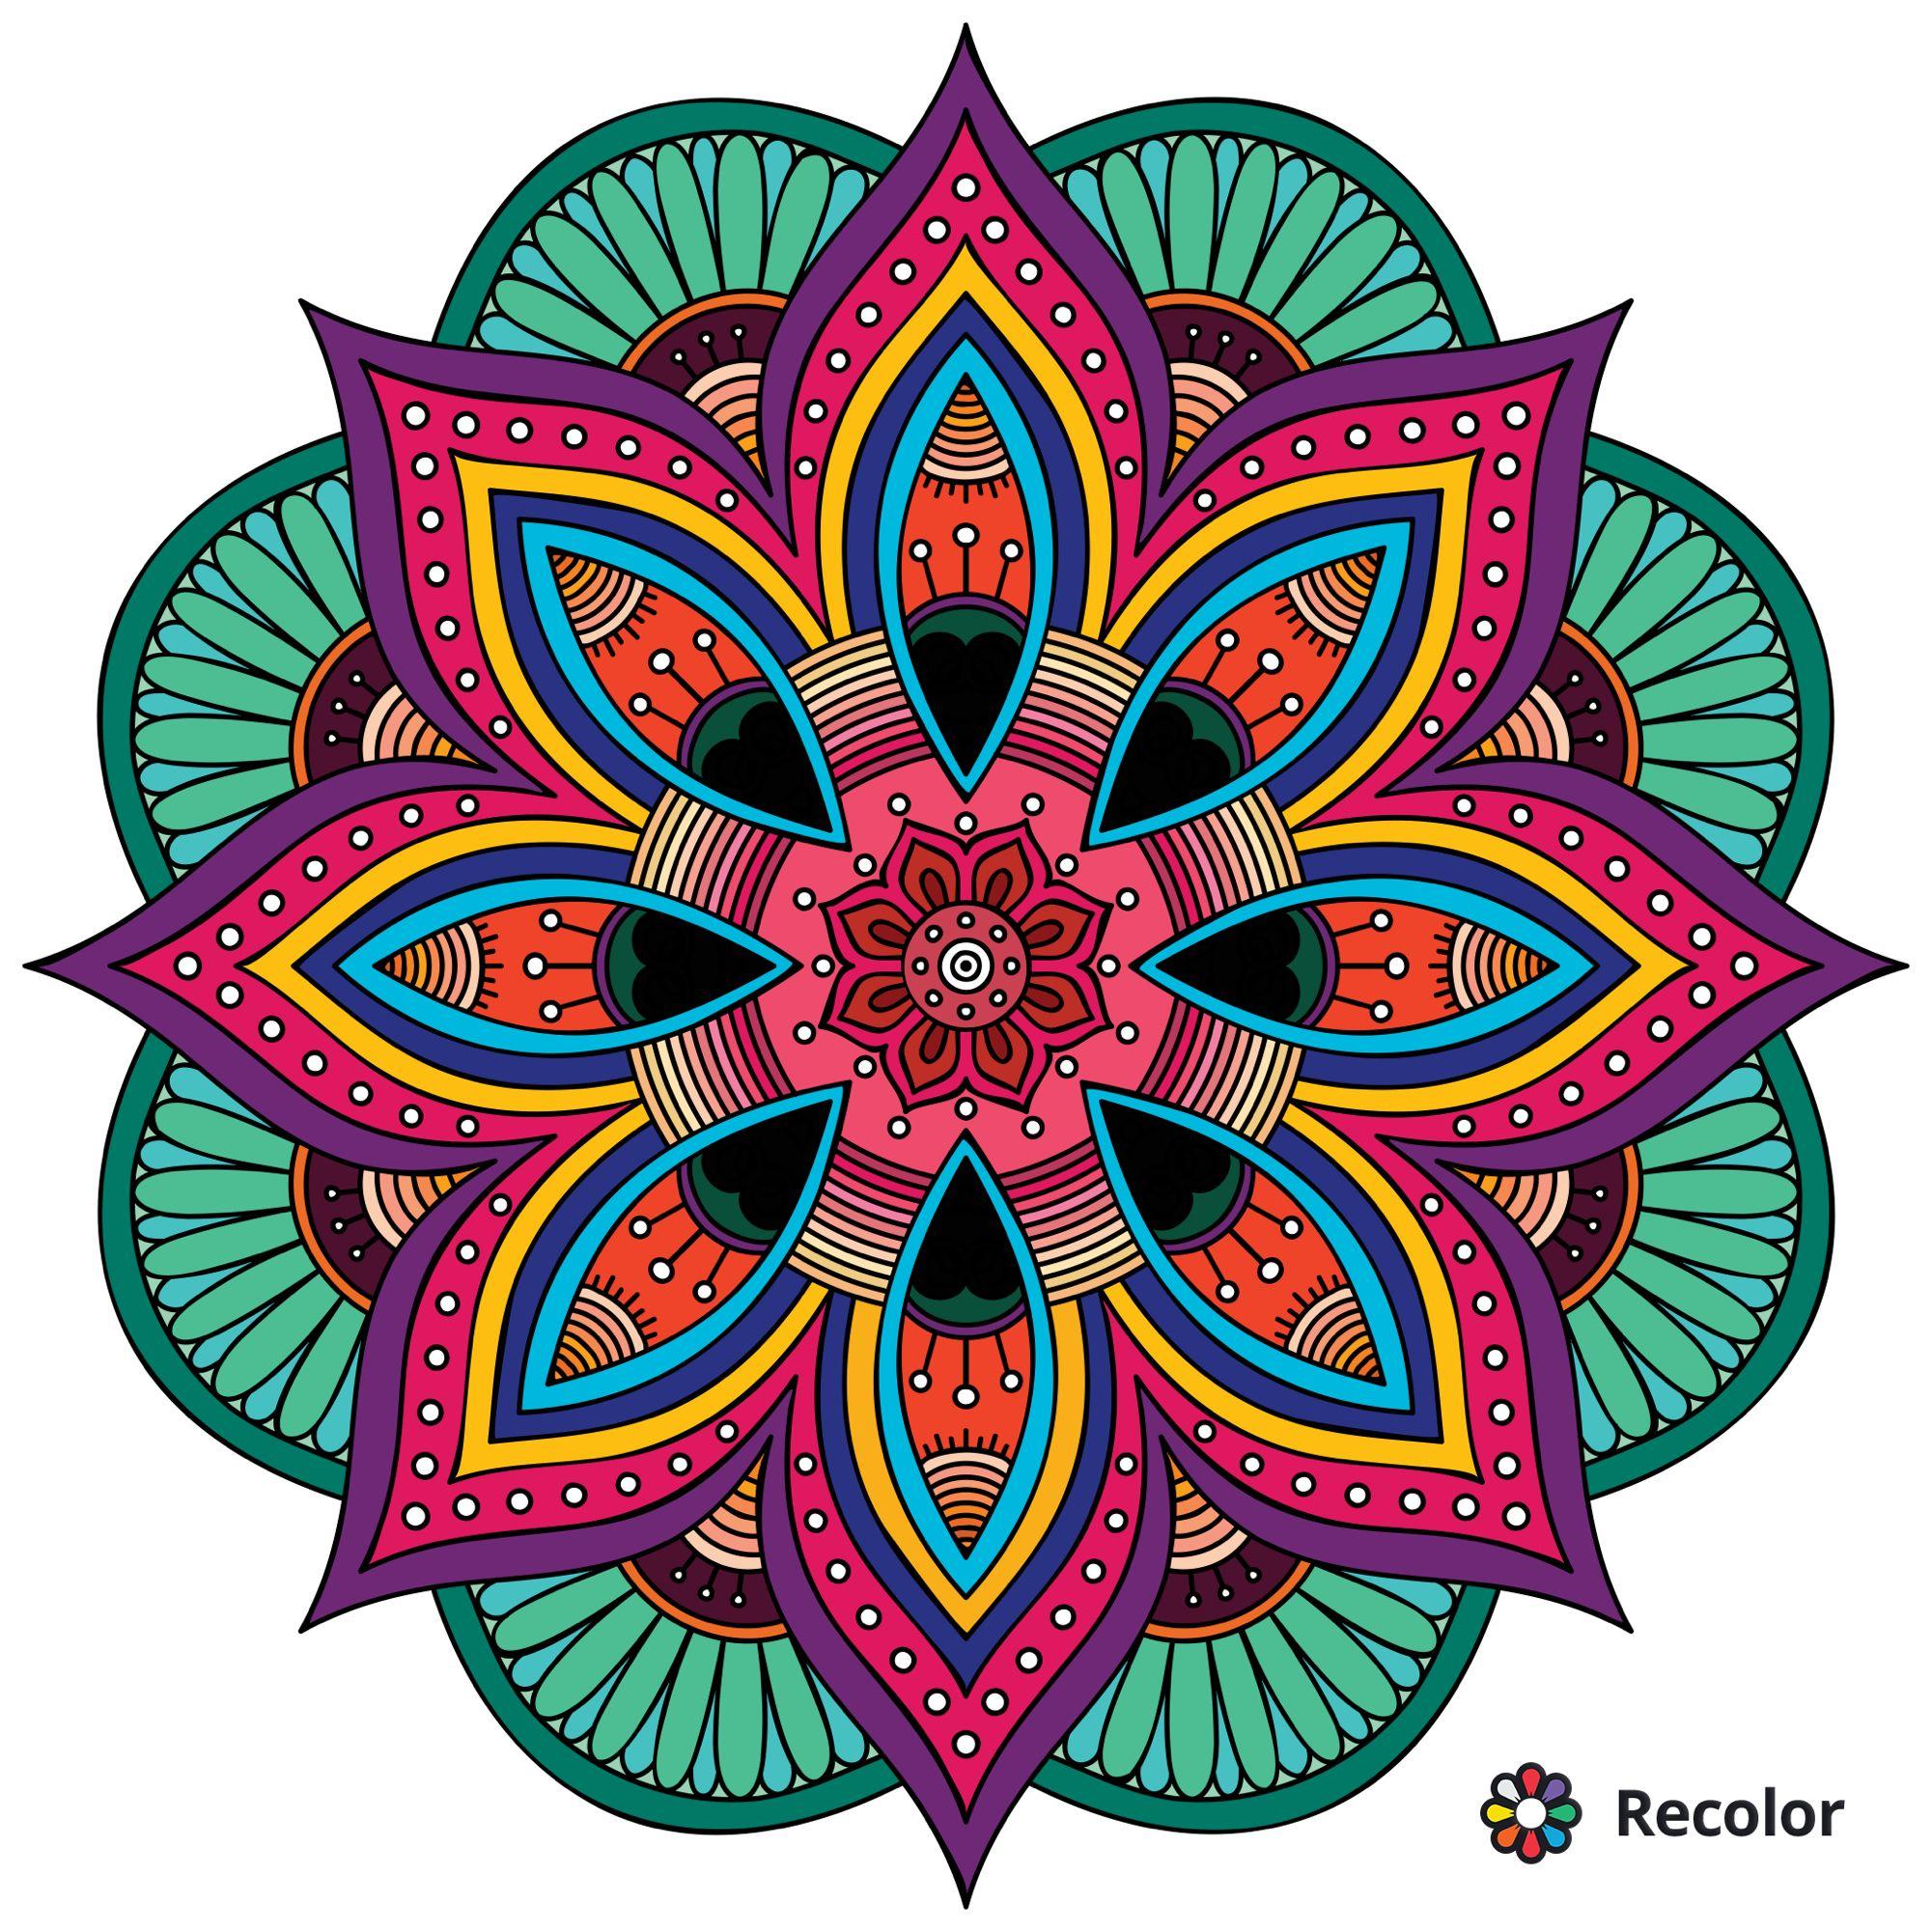 Recolor App Arte De La Geometría Sagrada Mandala Art Mandalas Pintadas